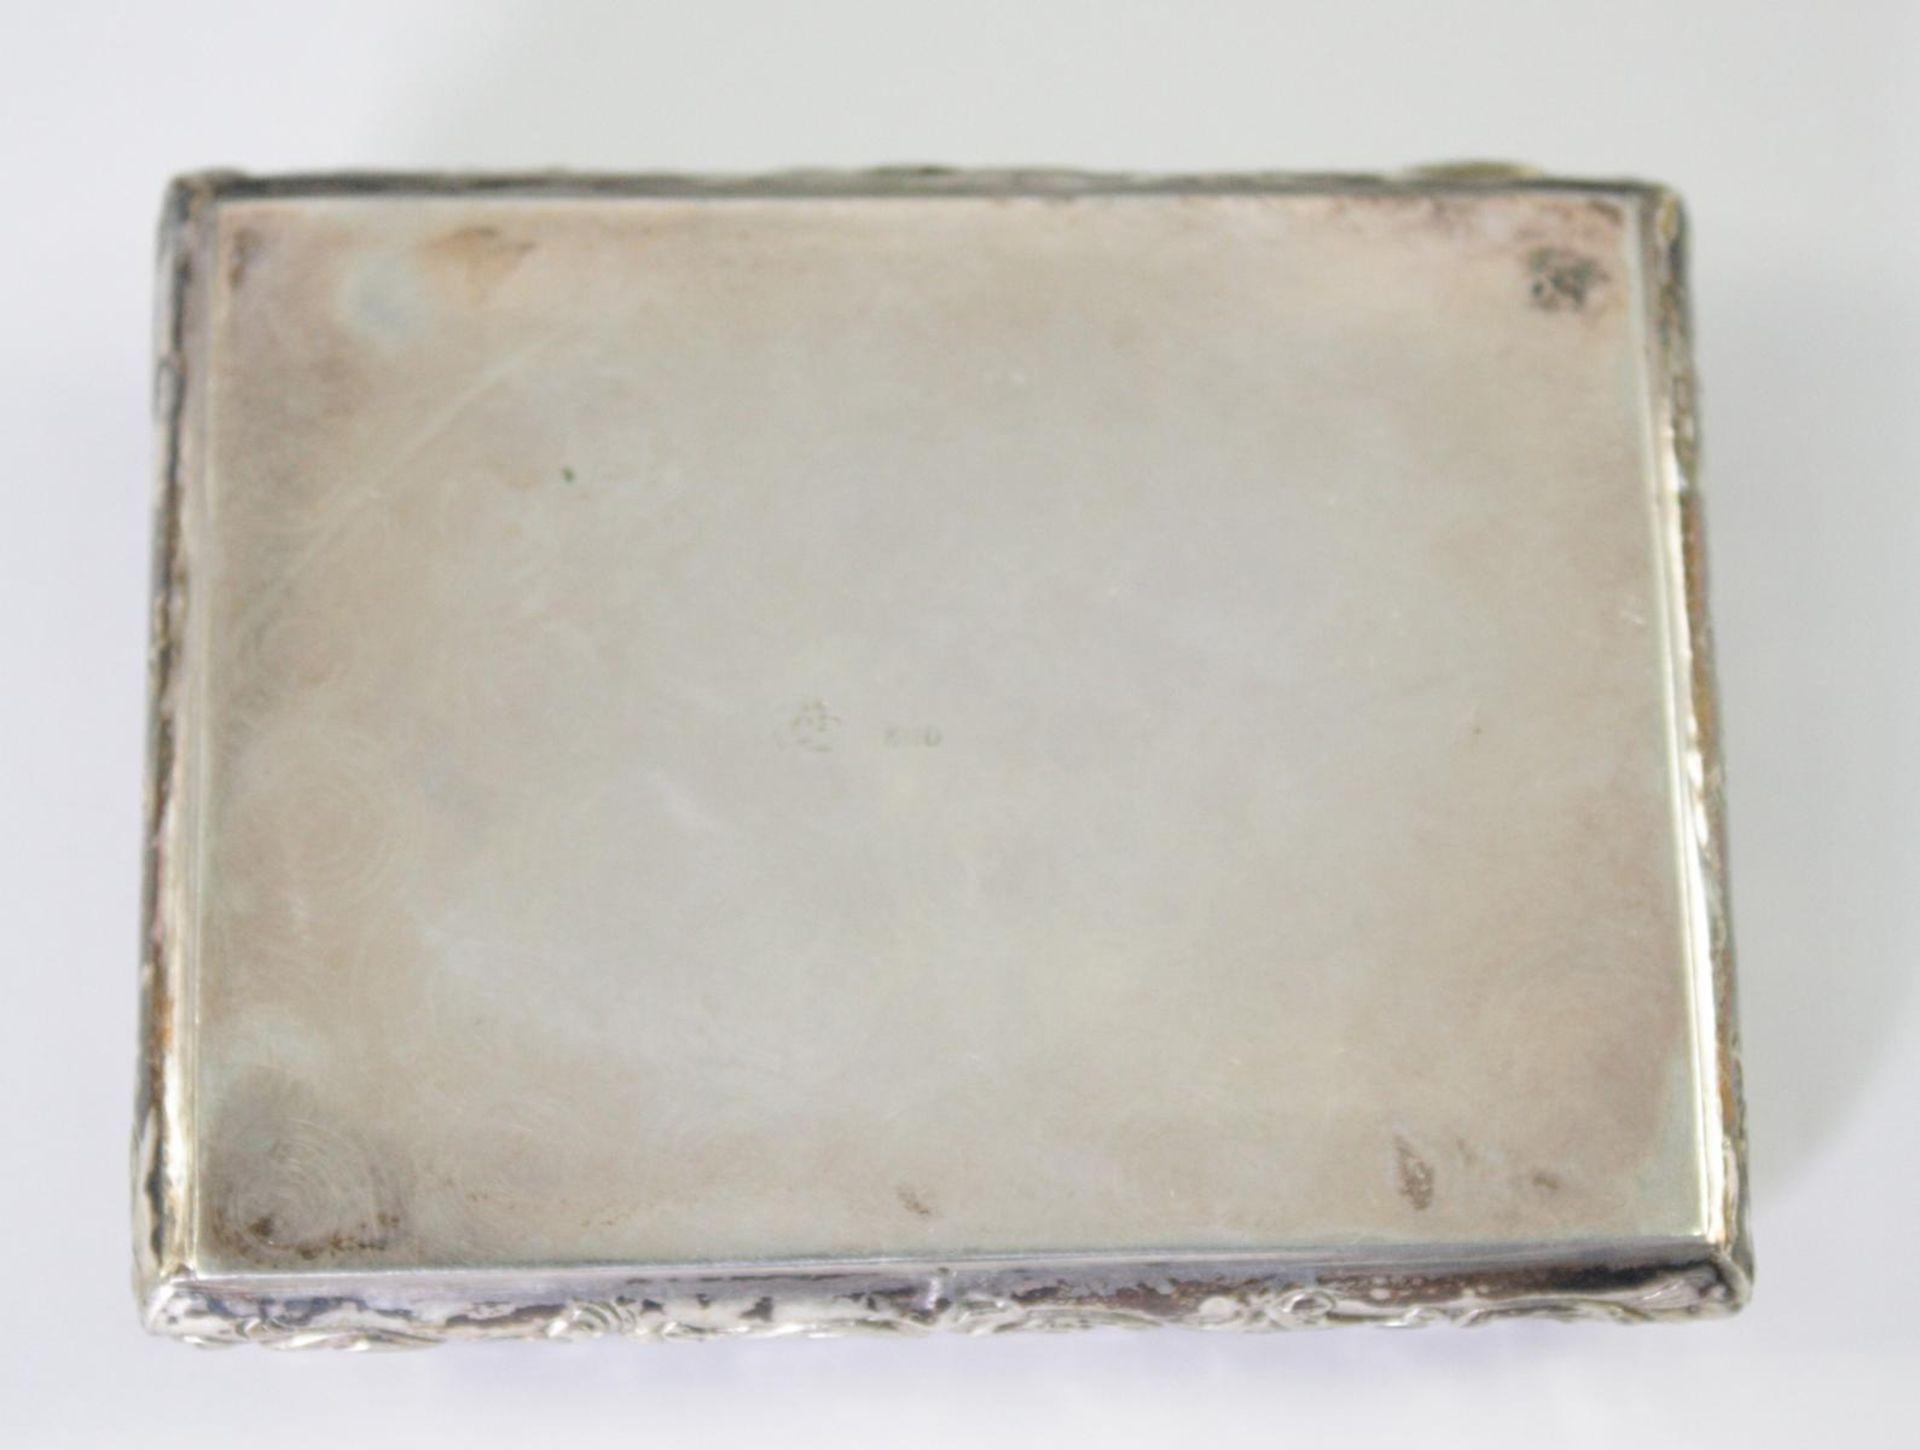 Silberne Deckeldose 800er Silber um 1900 - Bild 2 aus 4